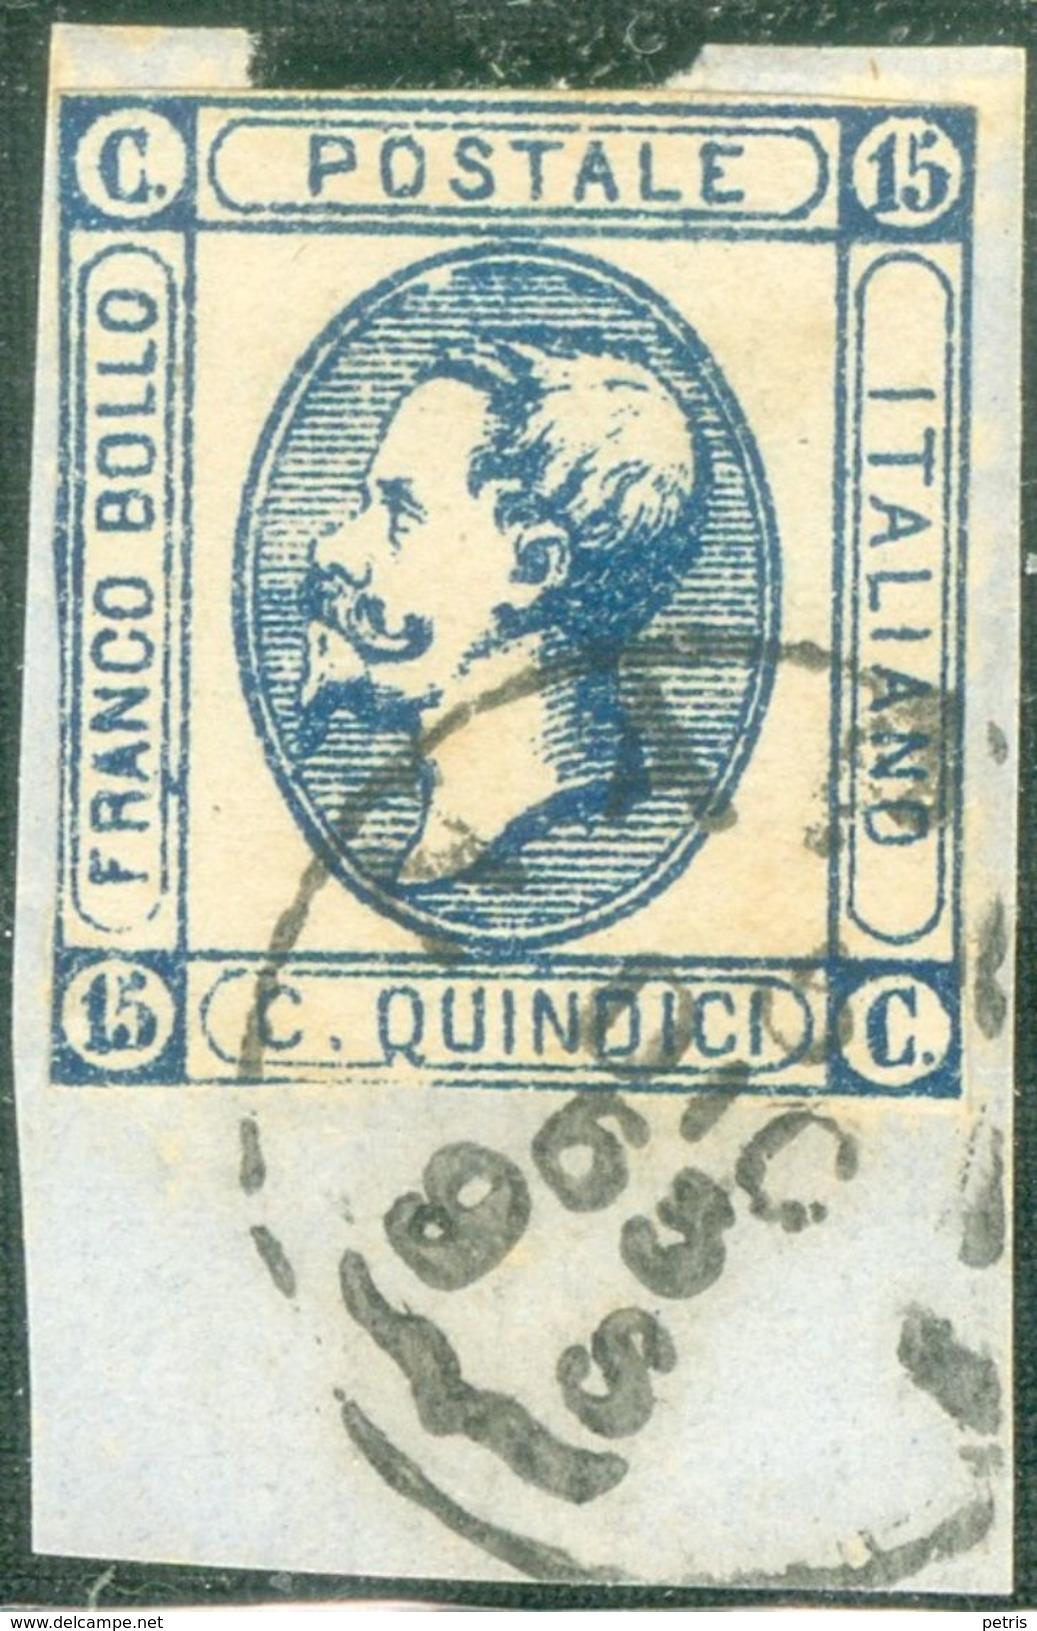 Italy 1863 Effige V. Emanuele Medaglione 15 C. 2° Tipo - Lot. RE13 - Usati